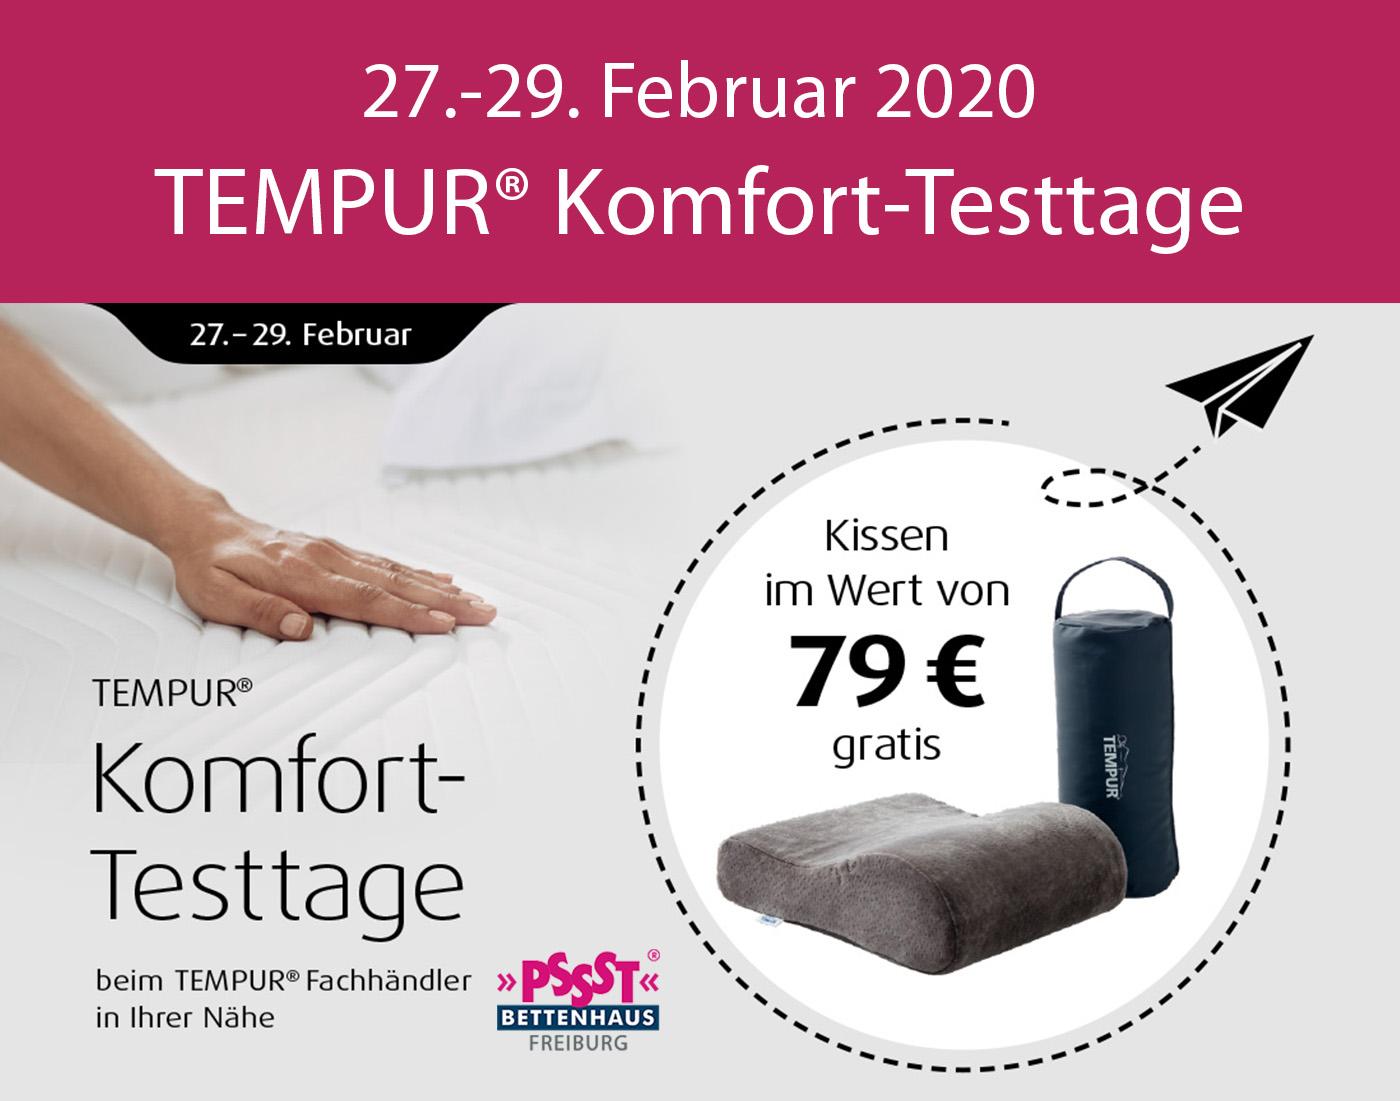 TEMPUR® Komfort-Testtage - 27. bis 29. Februar 2020